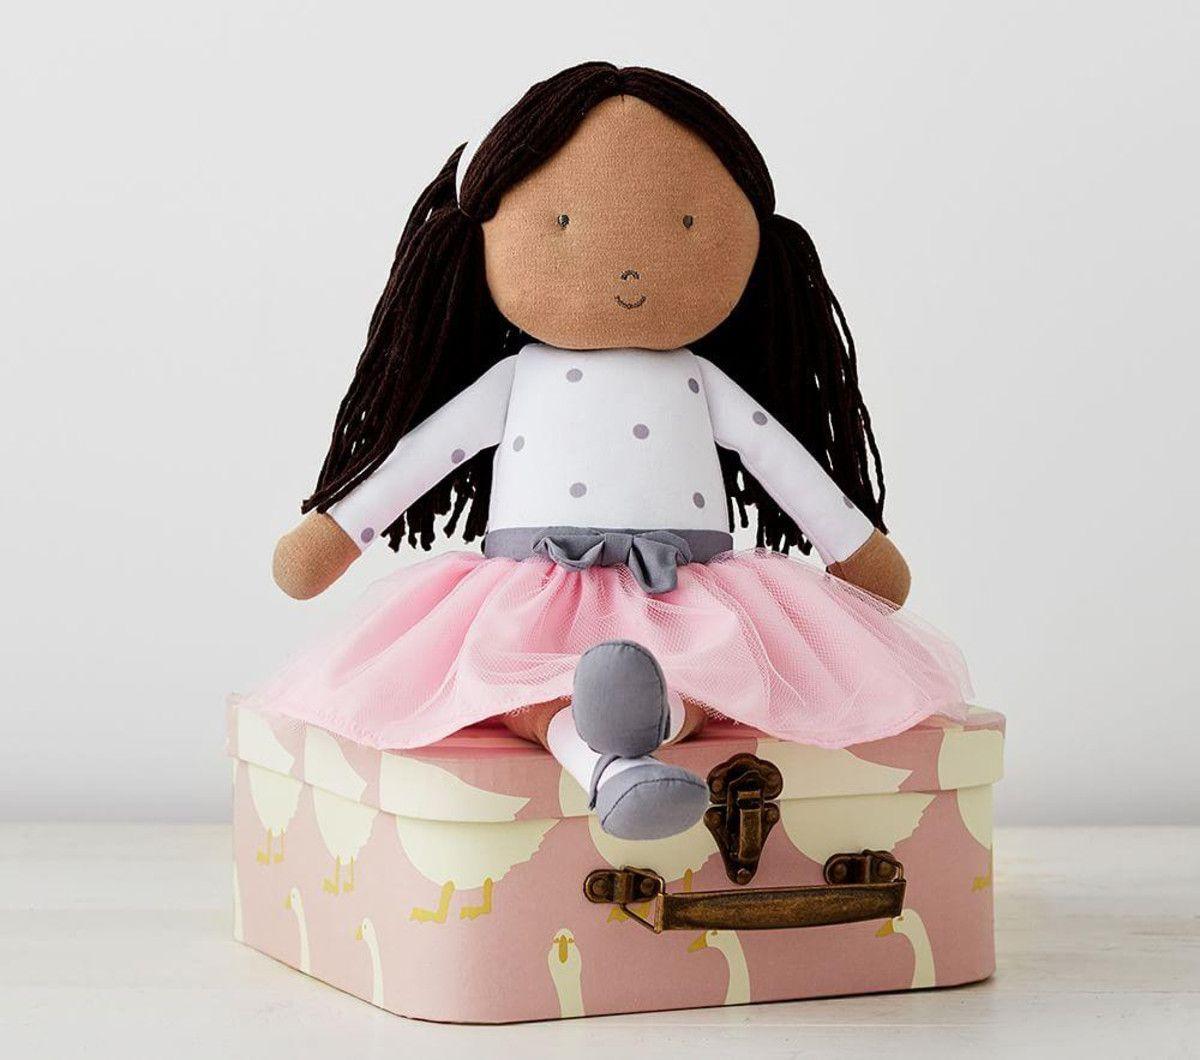 Soft Baby Doll Olivia Soft Baby Dolls Baby Dolls Best